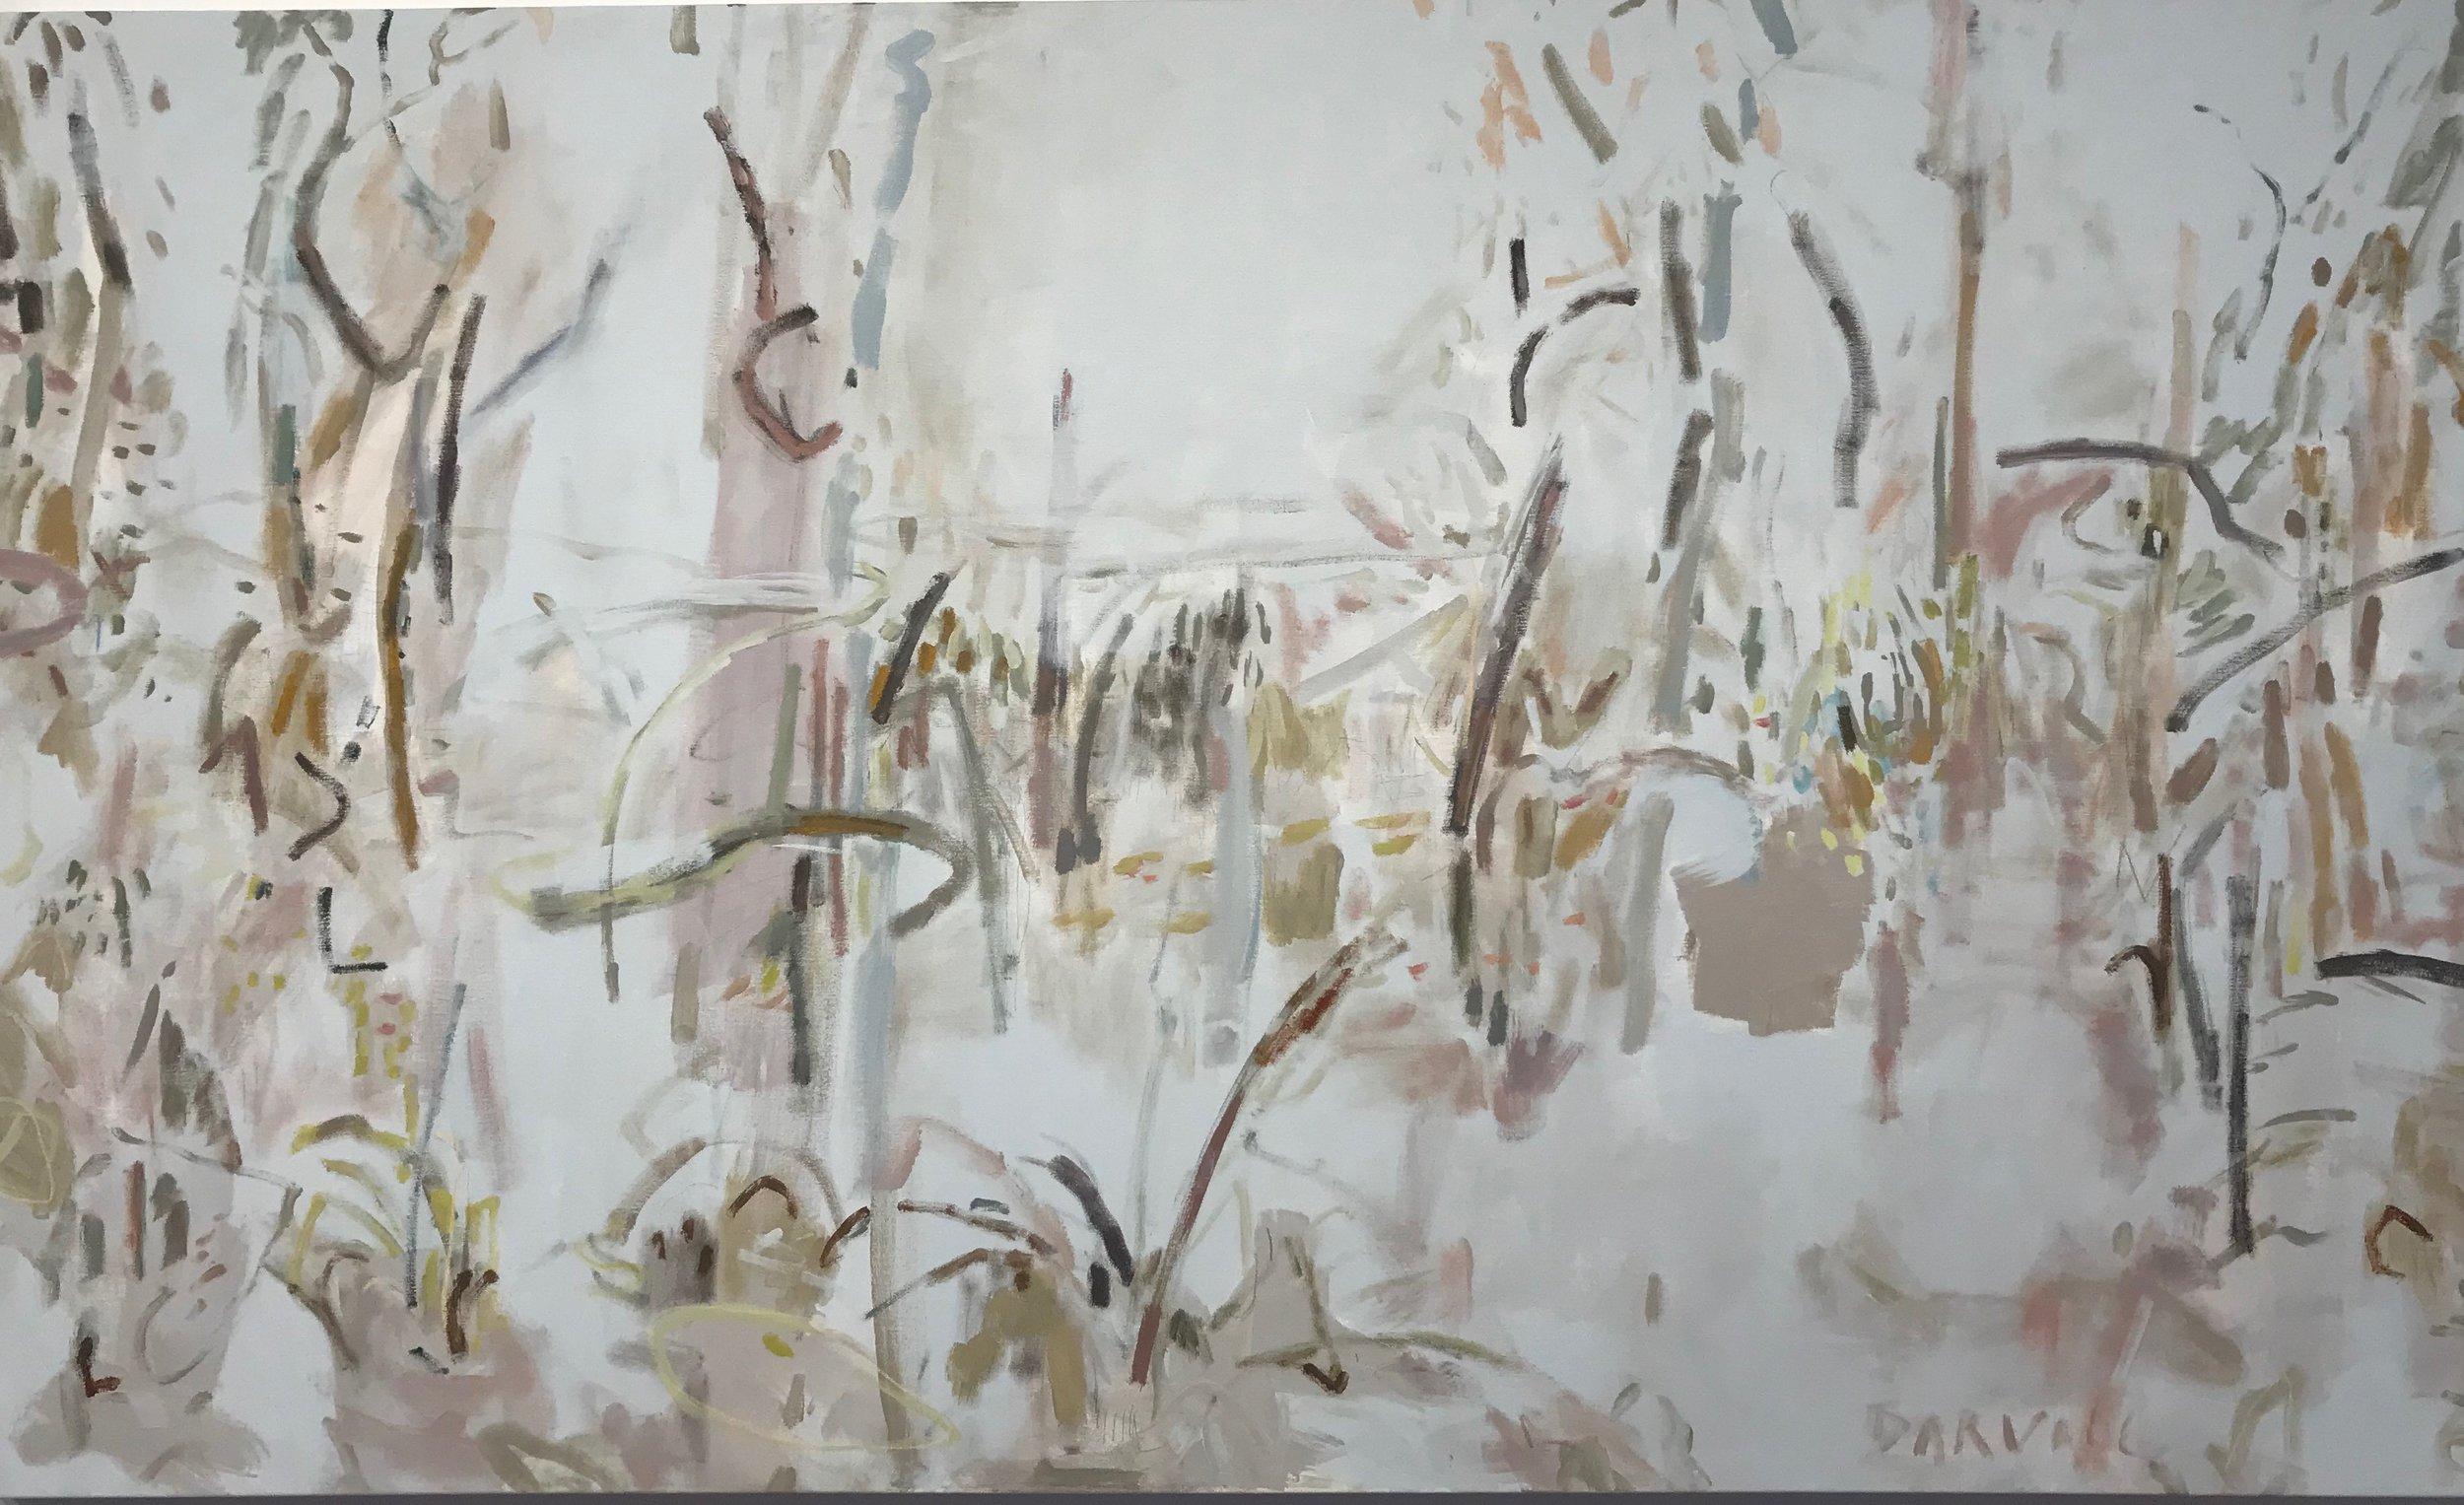 Moora Katta - Kings Park No 1 2019 Jo Darvall oil on canvas 118 x 195.5 cm contact  Rochfort Gallery